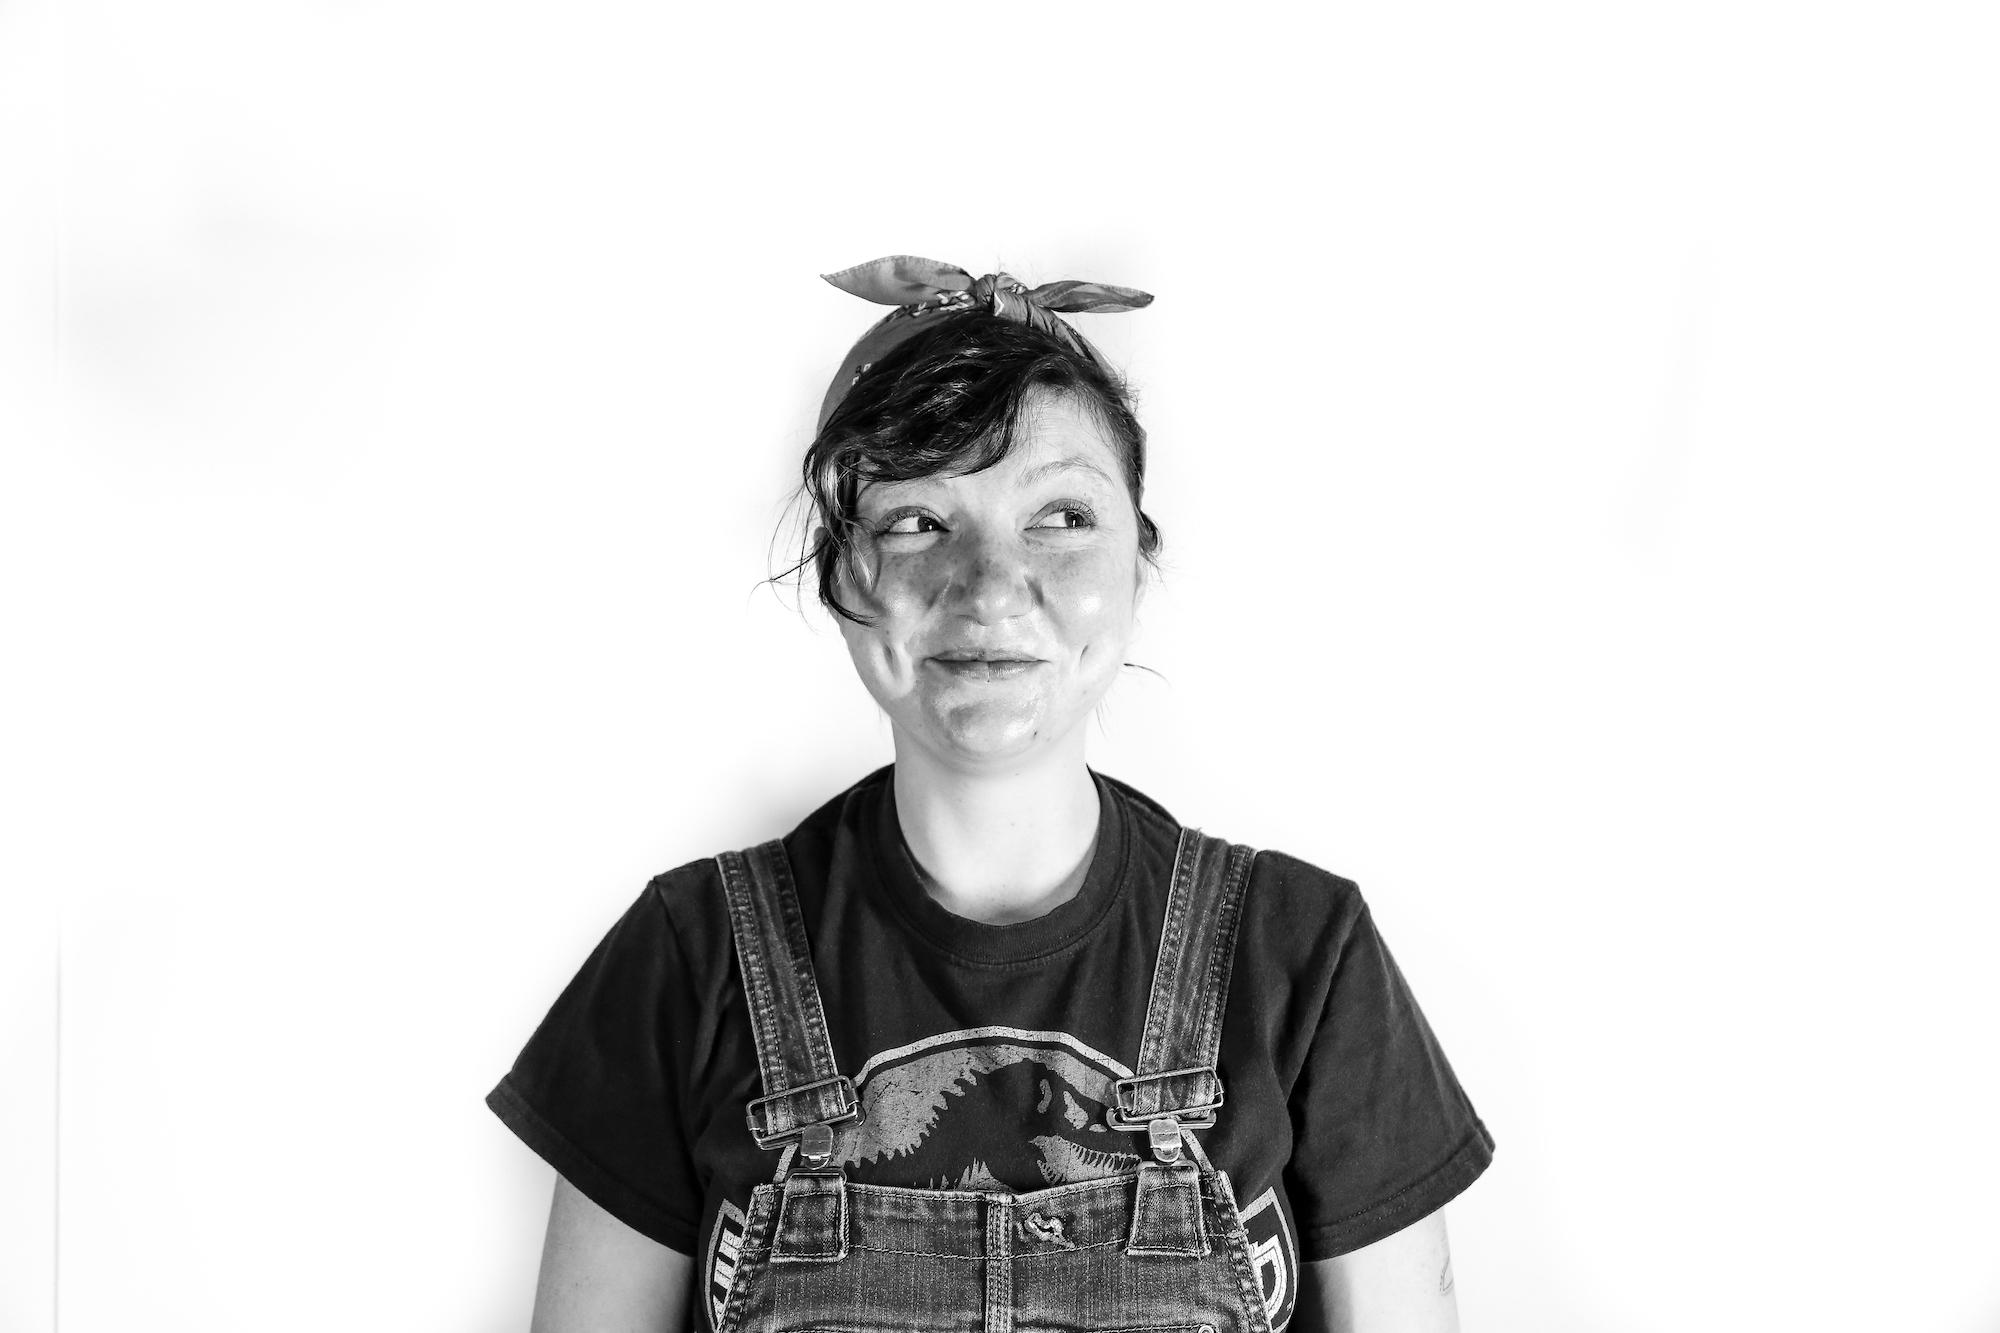 Liz - Superior Ink team member